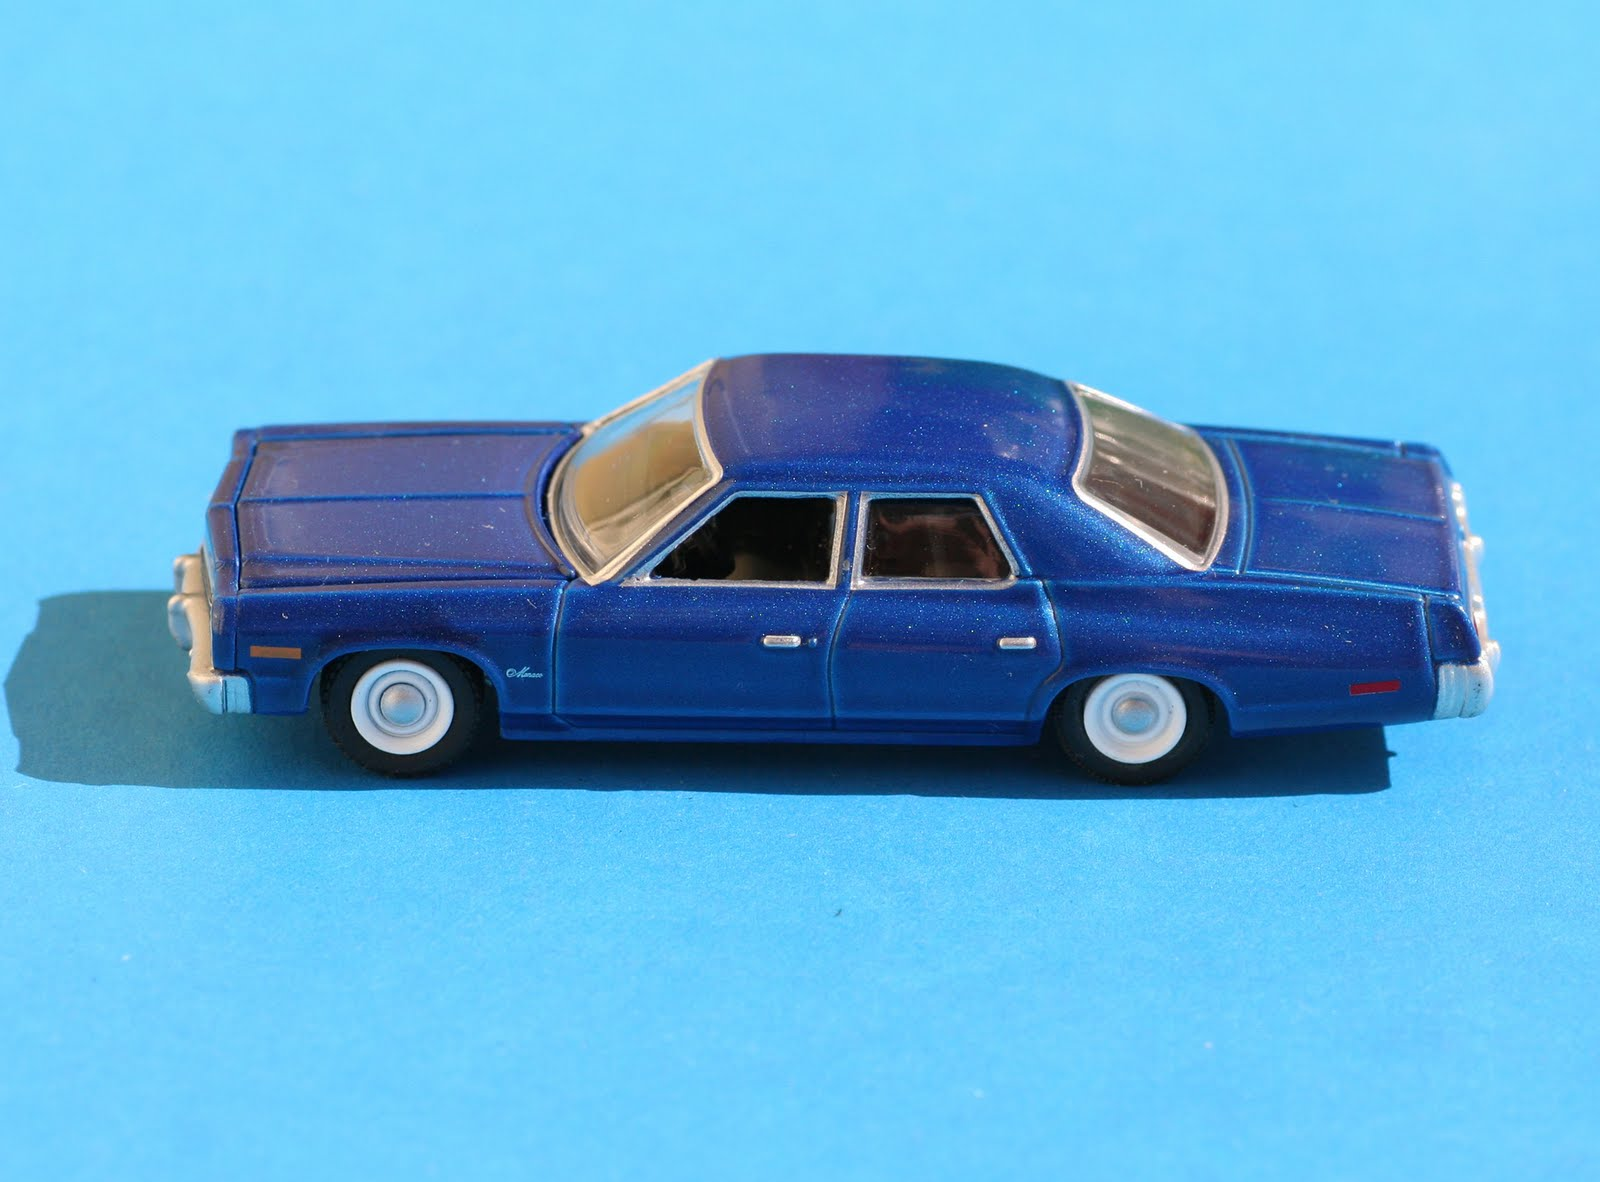 Incredible mini garage dodge monaco 1975 greenlight 1 64 for Garage mini monaco